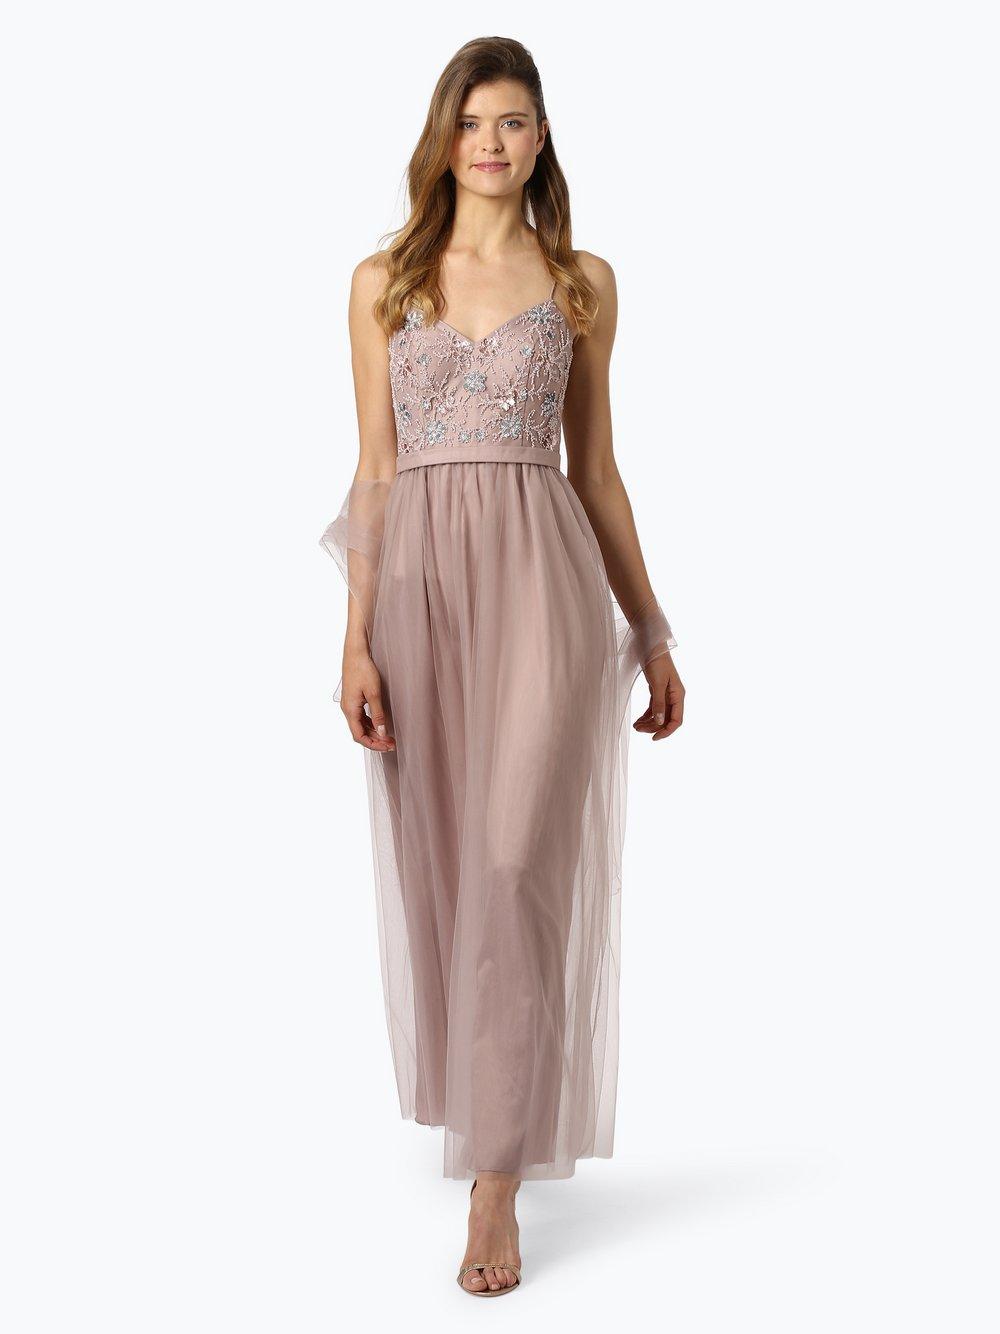 Laona – Damska sukienka wieczorowa, beżowy Van Graaf 443711-0001-09940